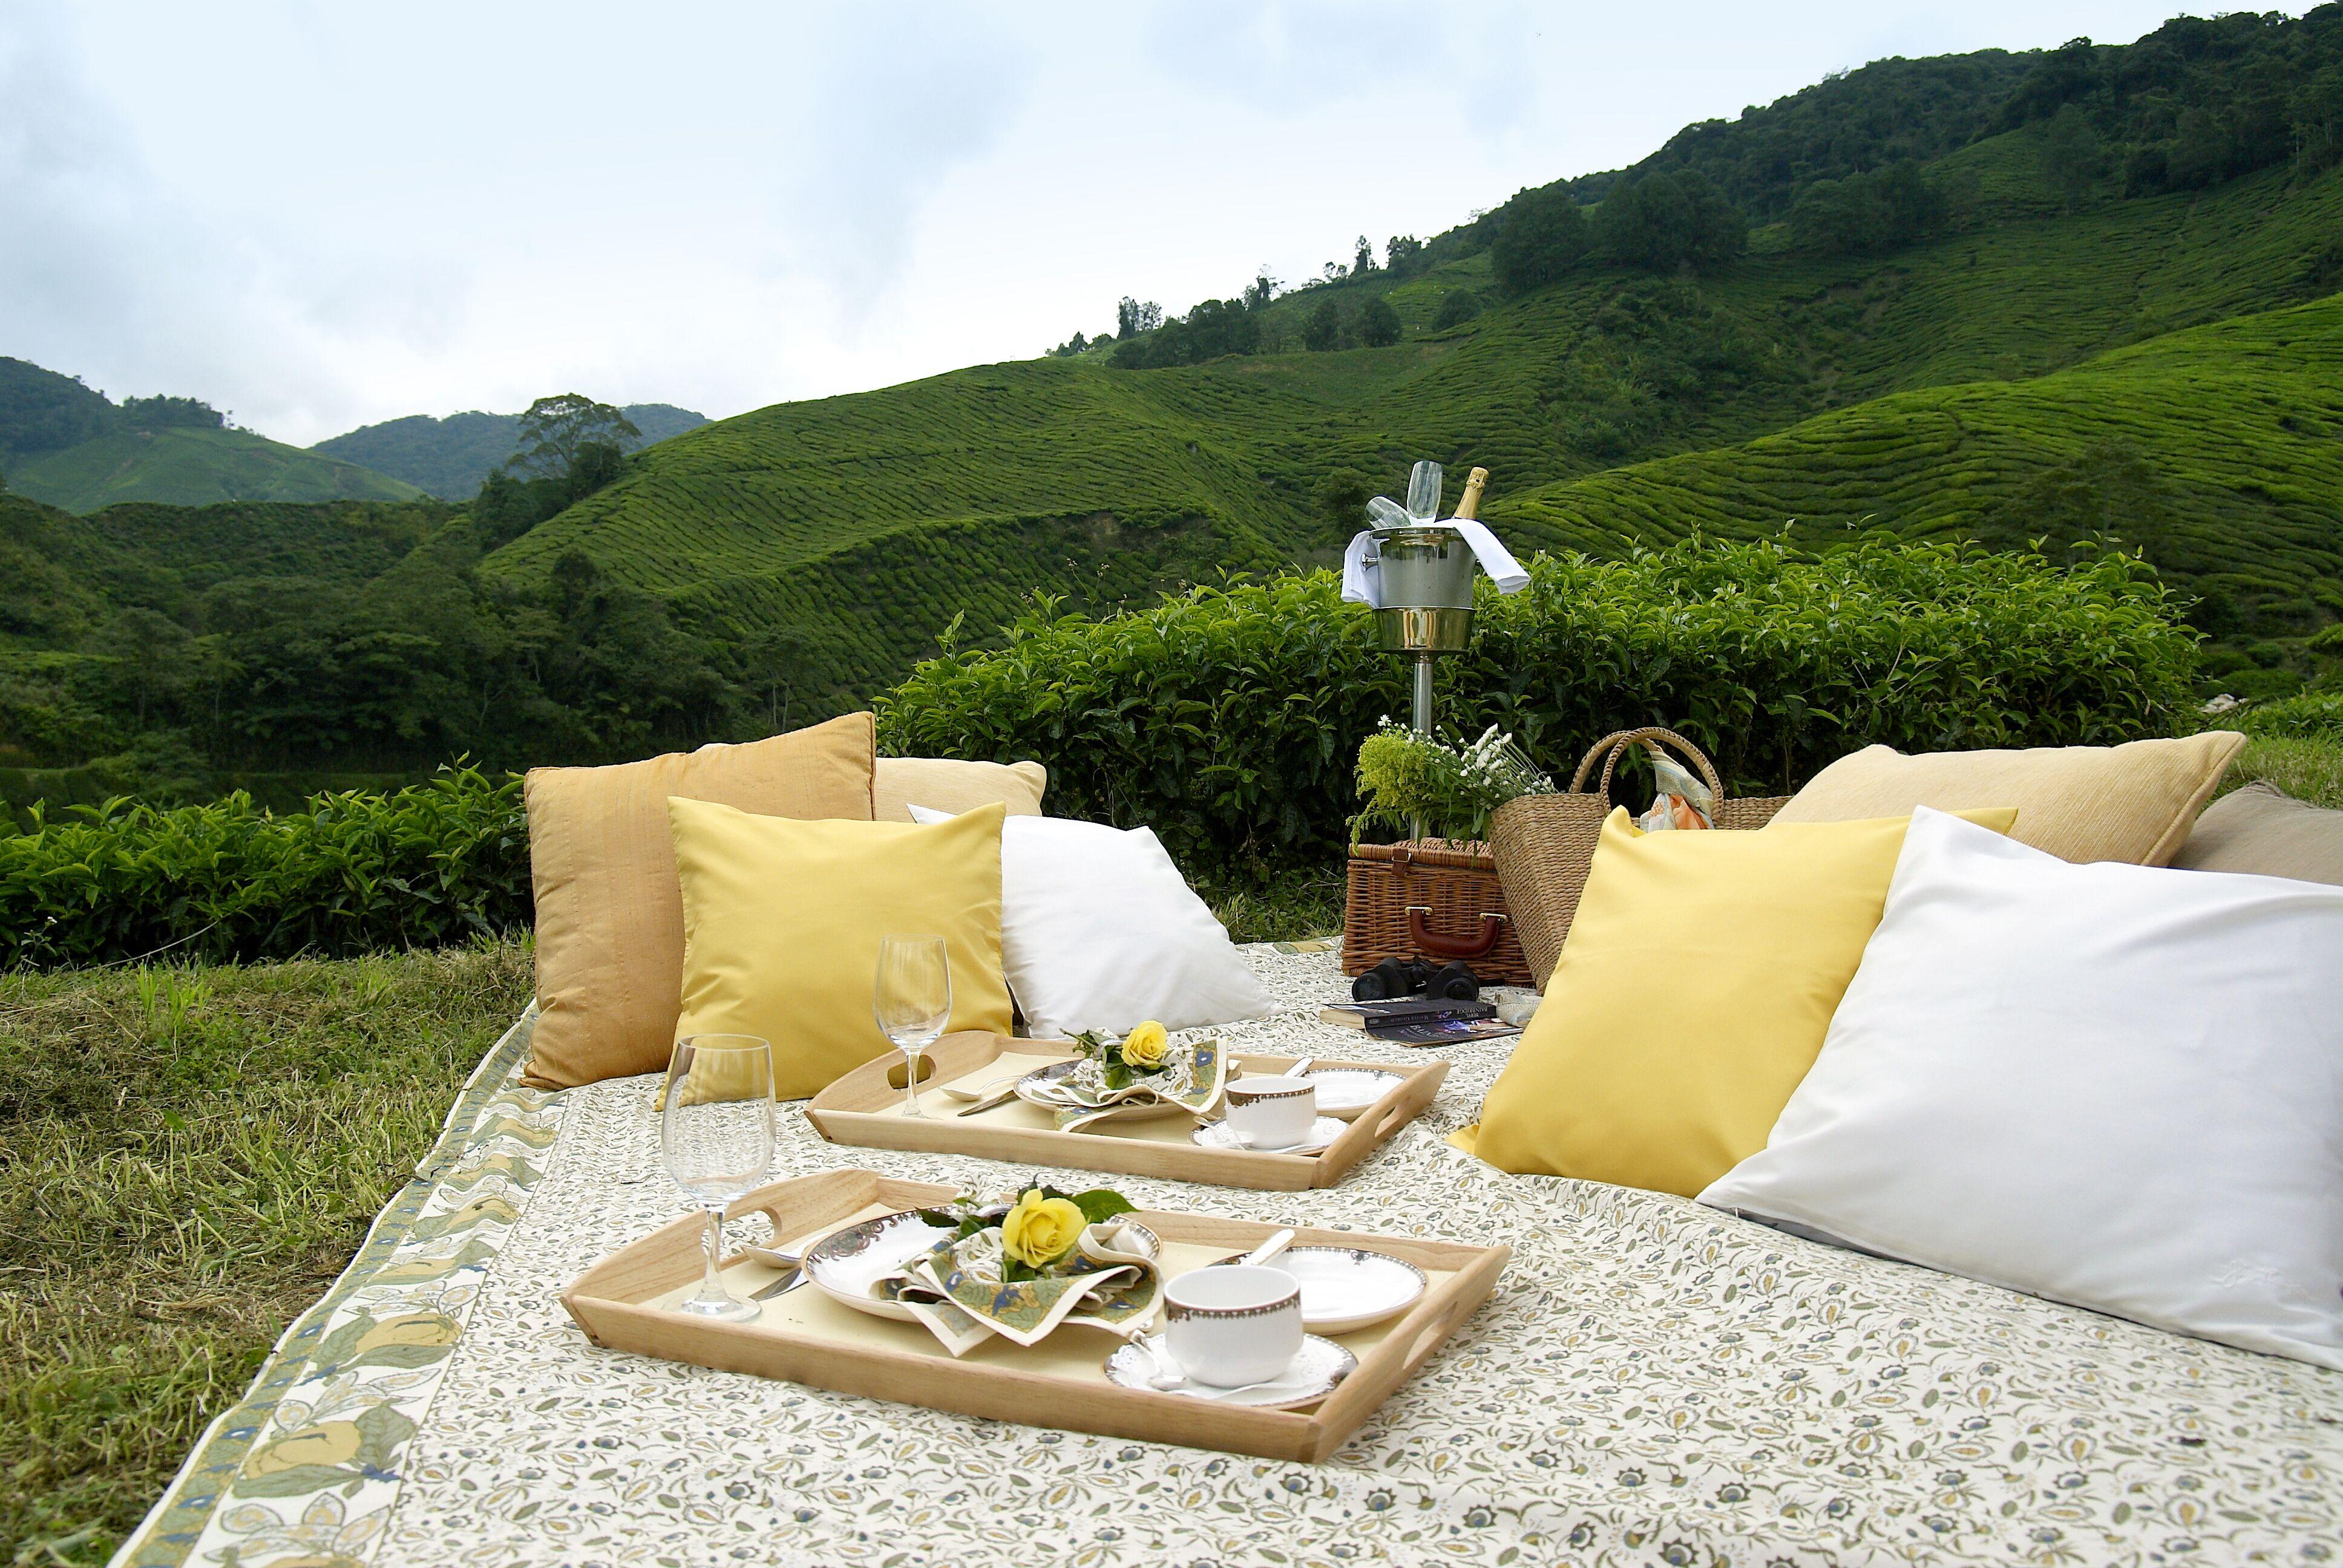 swanky picnic setup. Cameron highlands, Romantic picnics